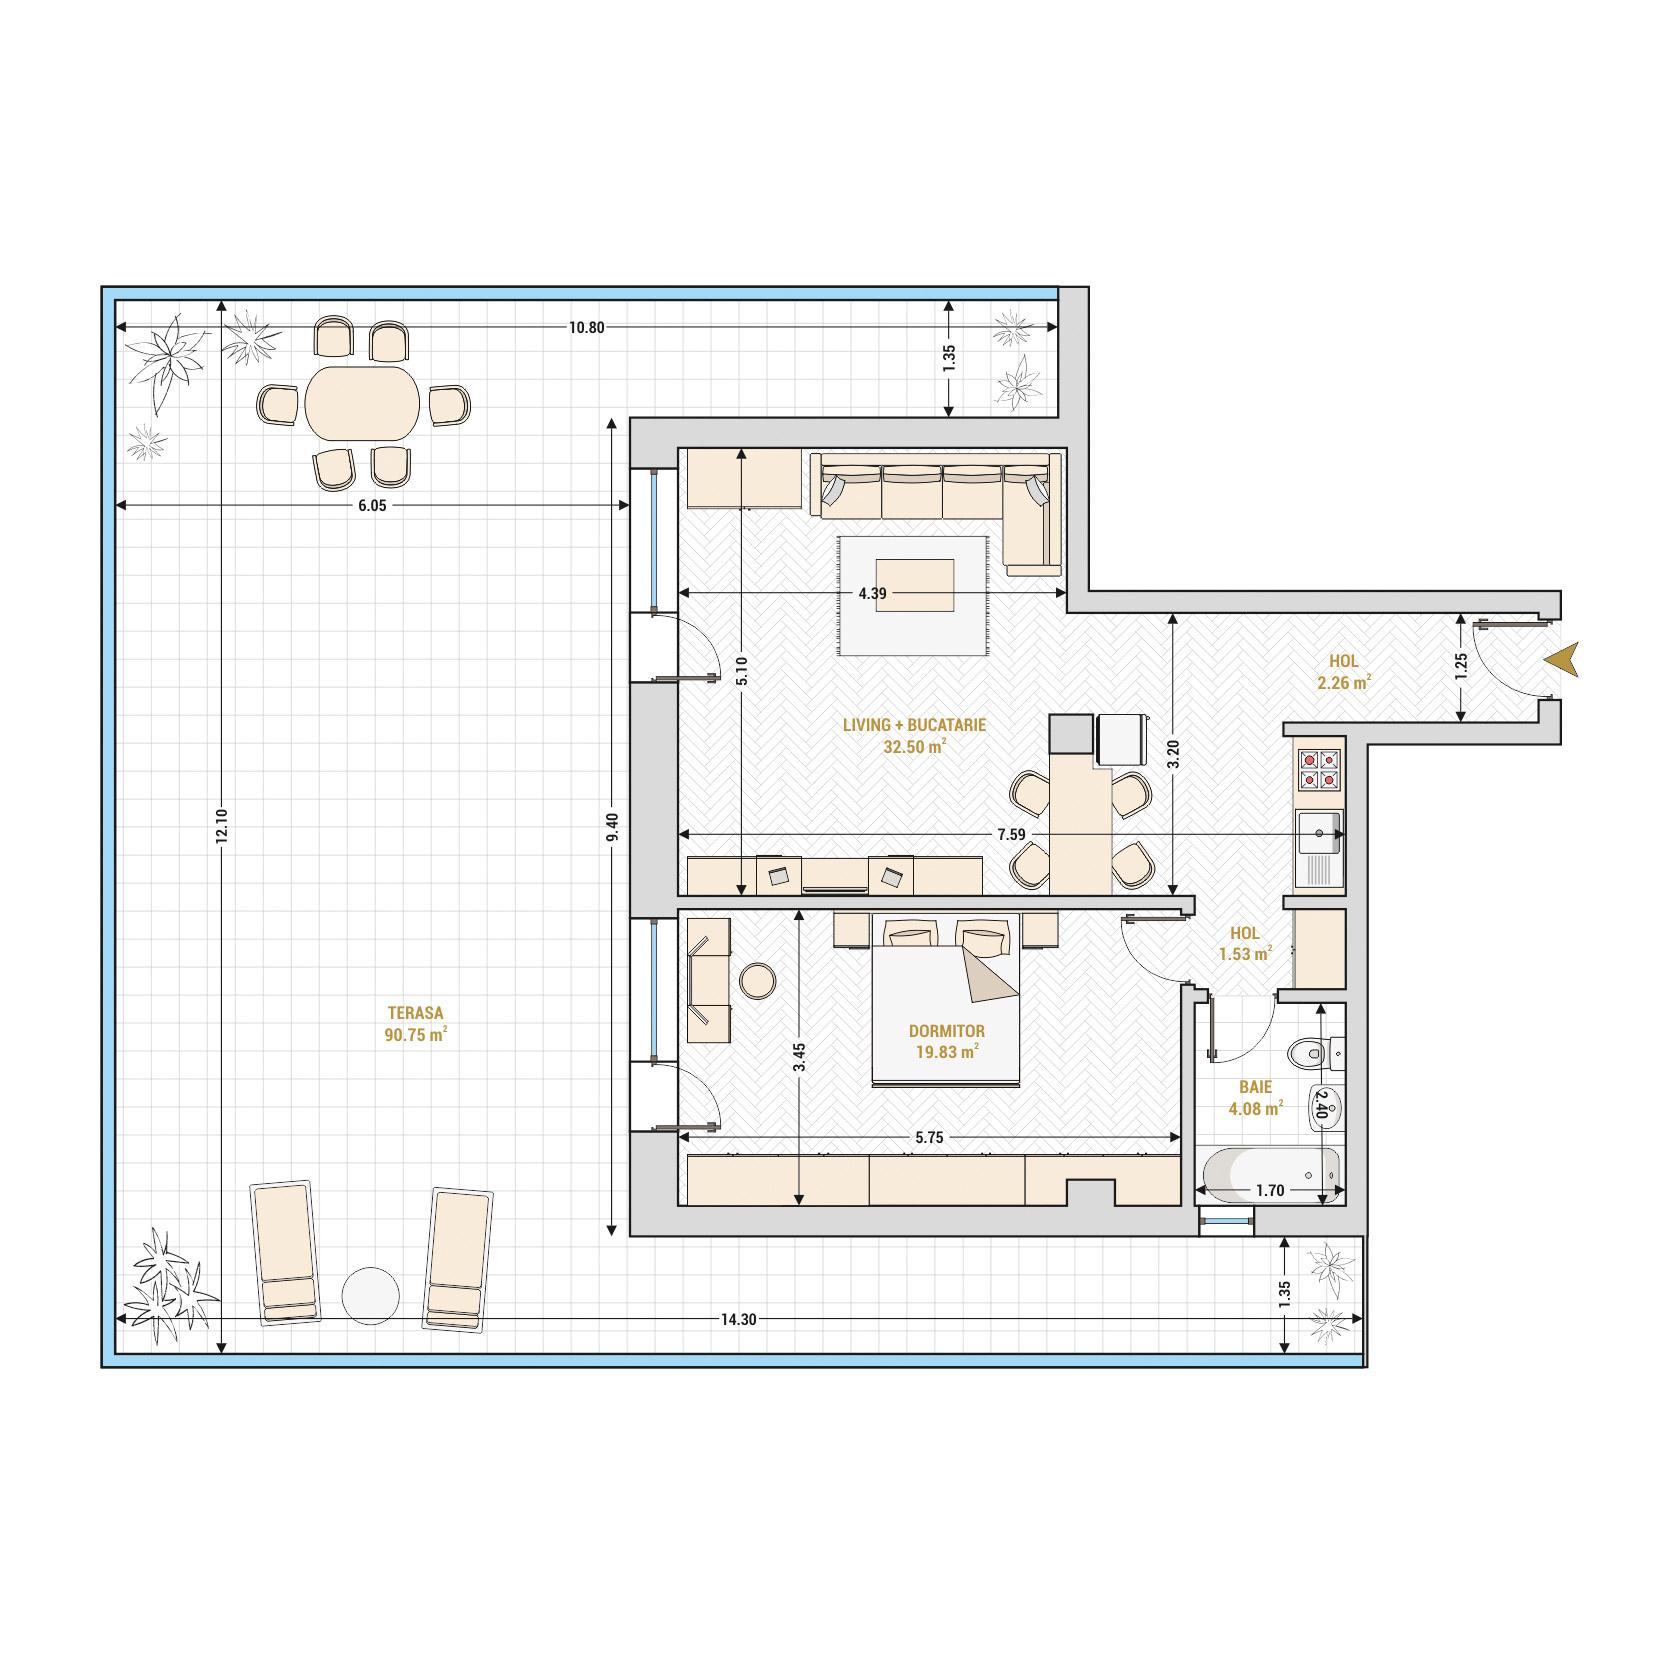 Apartament 2 camere de vanzare Bucuresti - Catedral Residence - Marriott, Piata Unirii, 13 Septembrie, Izvor - Tip 9 - T1